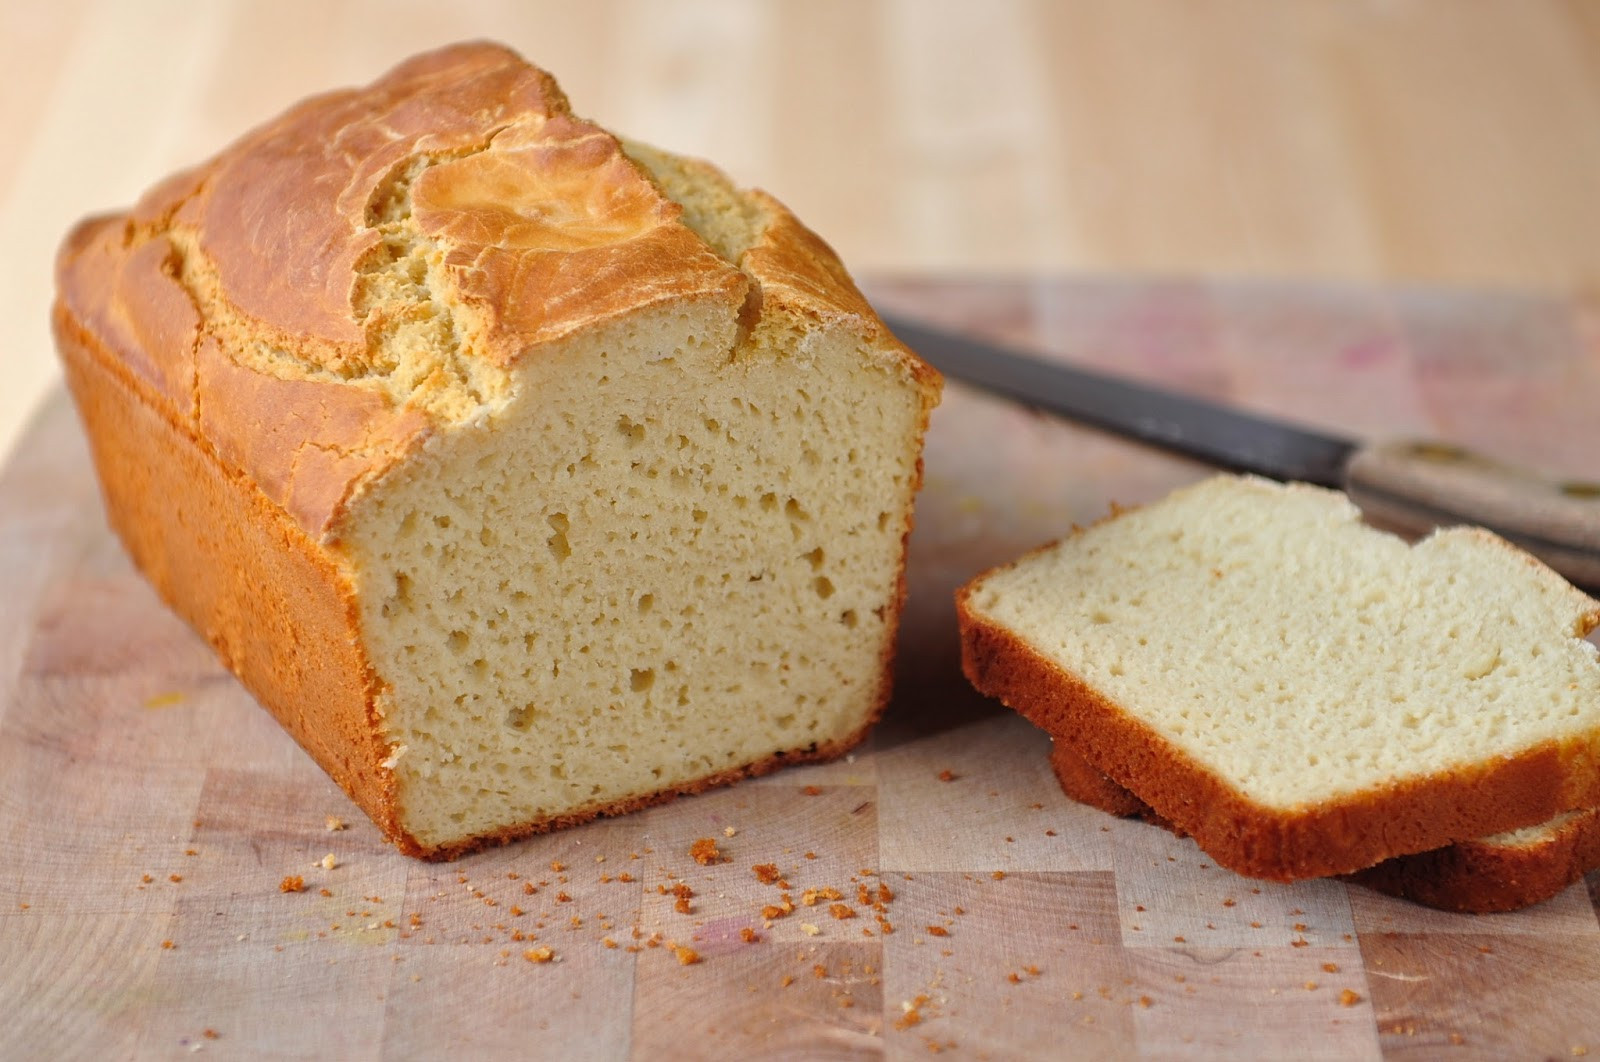 Gluten Free Yeast Bread Recipe  Nourishing Meals Sprouted Brown Rice Bread gluten free